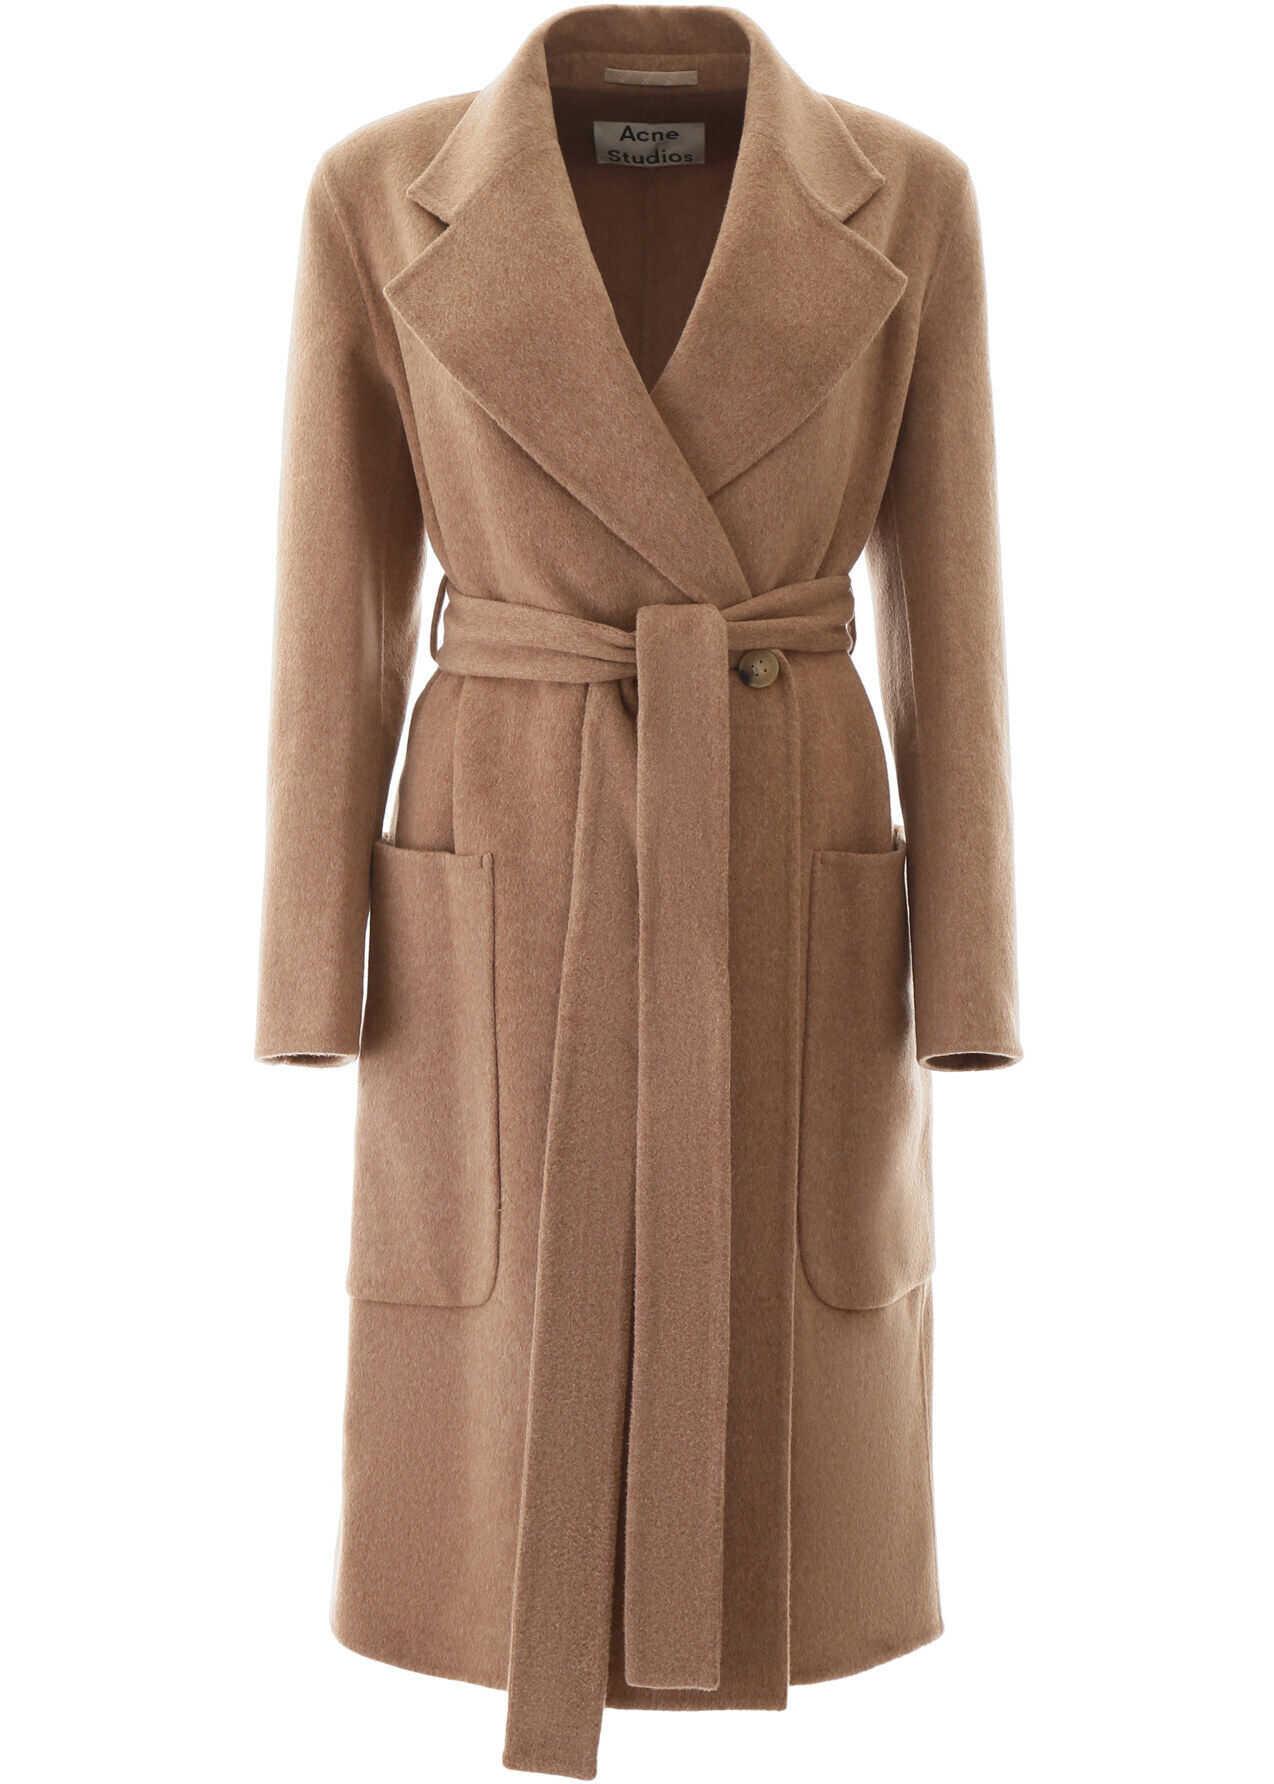 Acne Studios Wool Coat CAMEL MELANGE